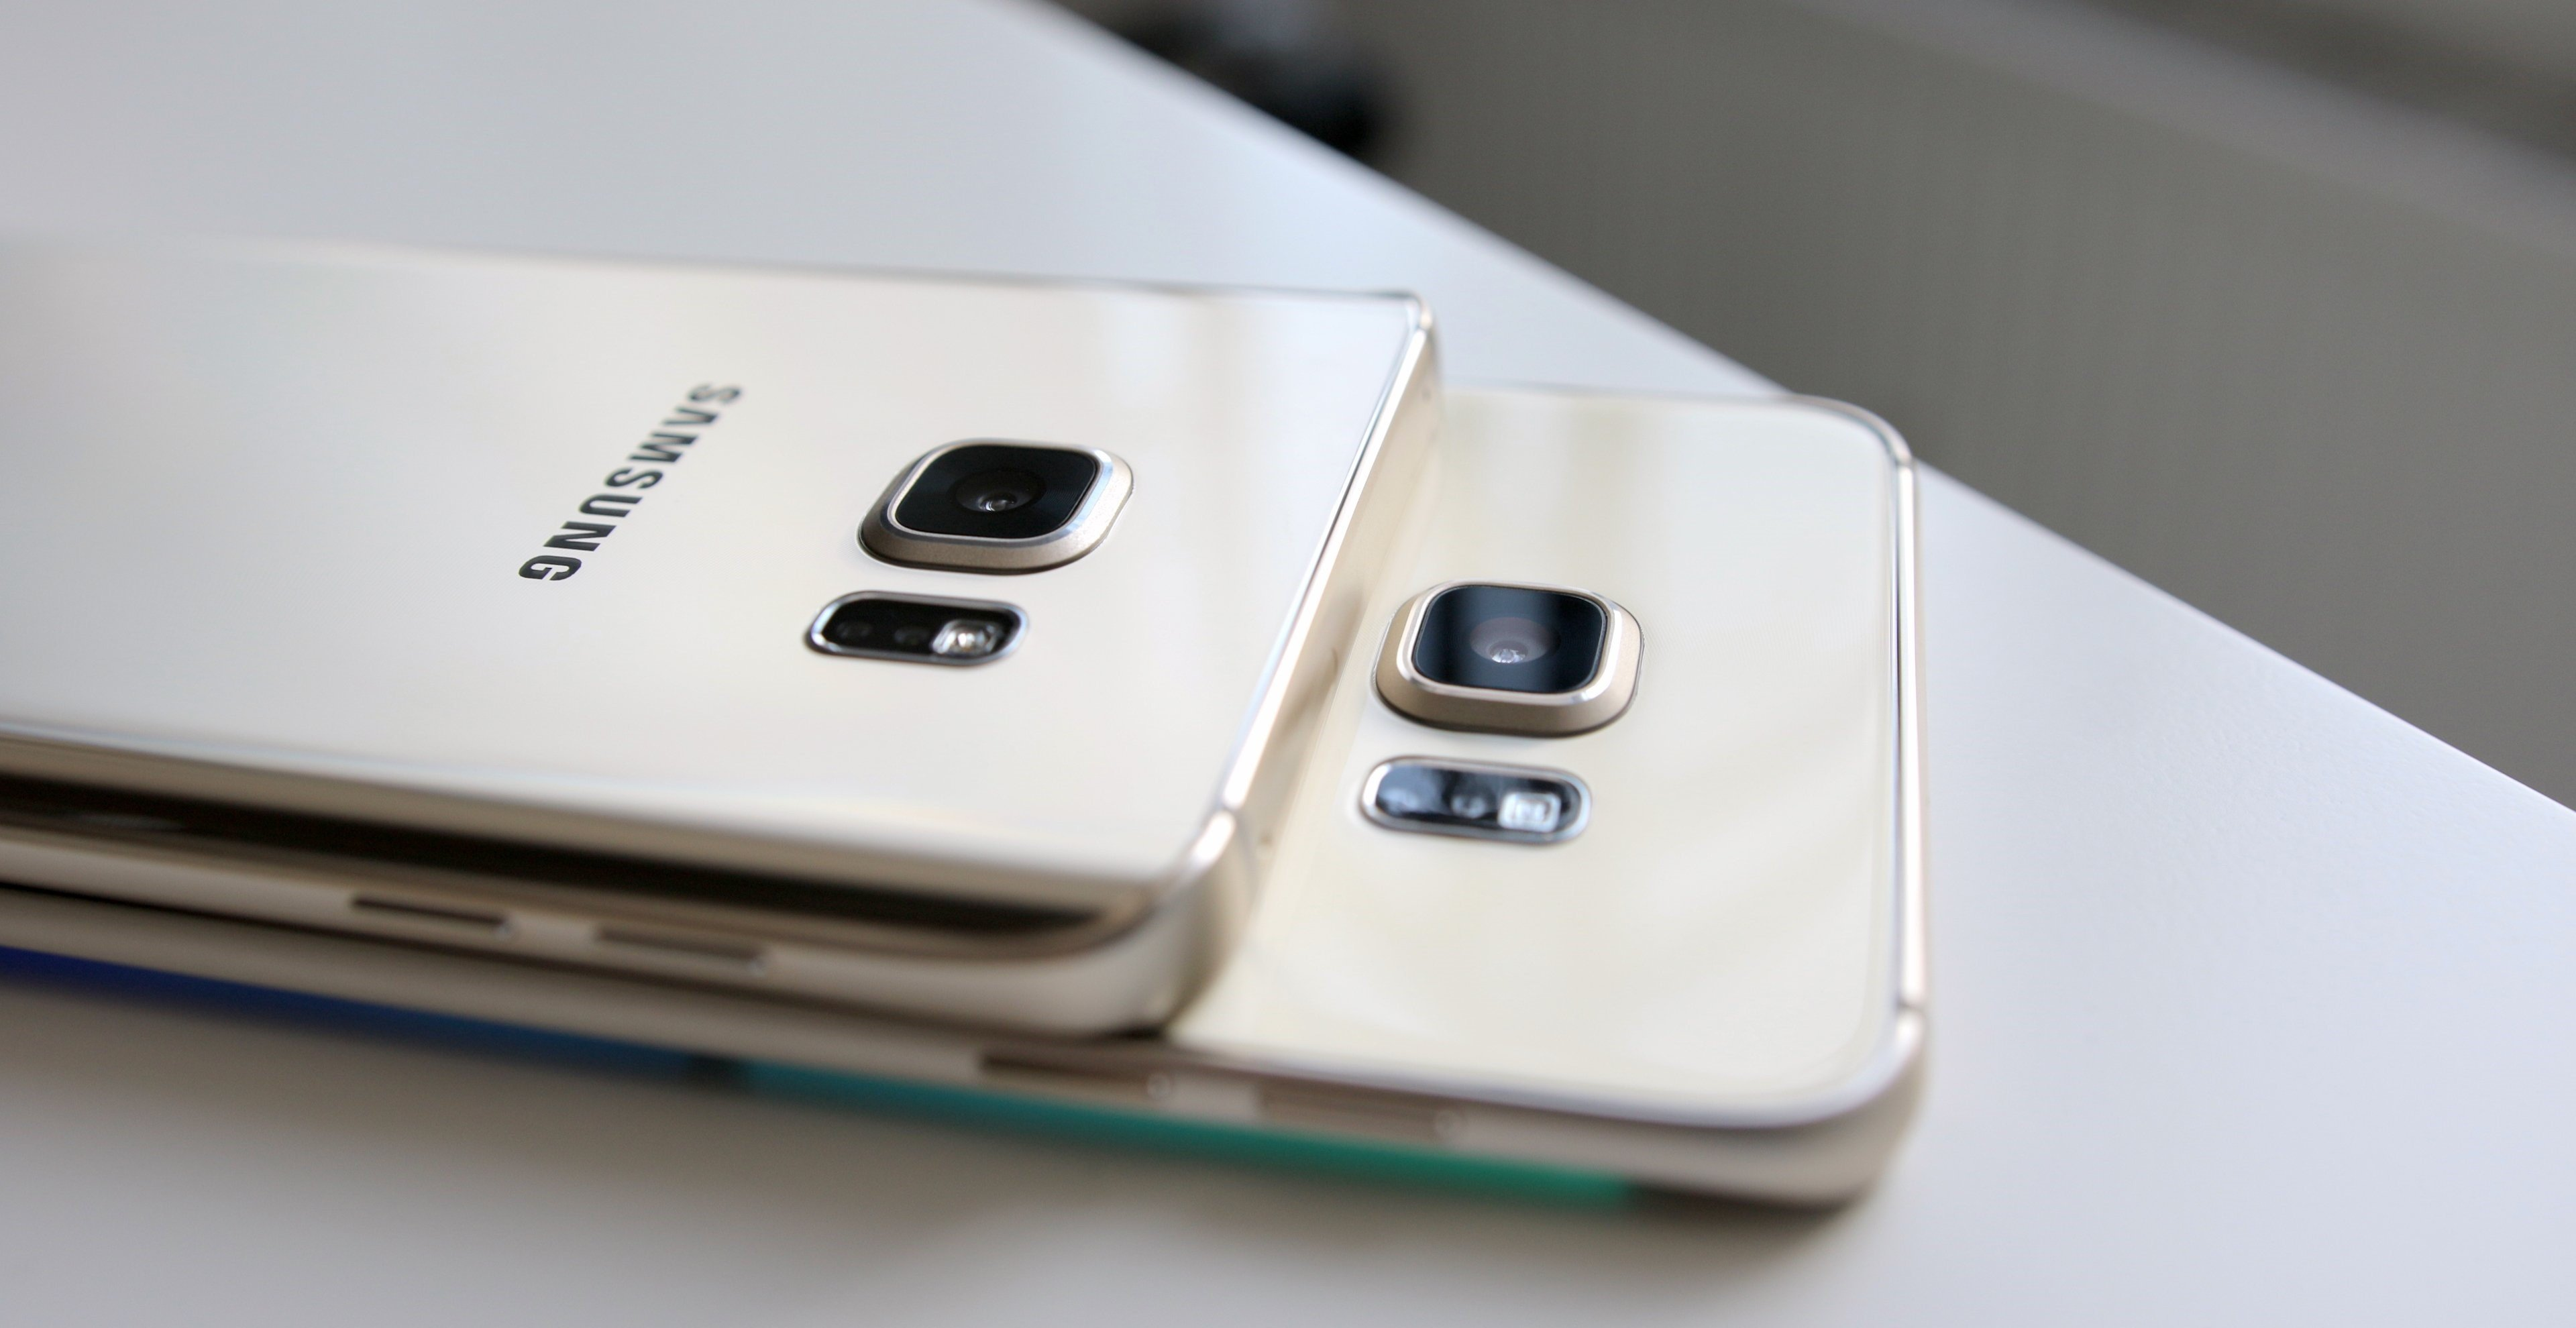 Android Marshmallow 6.0: in arrivo su Samsung Galaxy J5